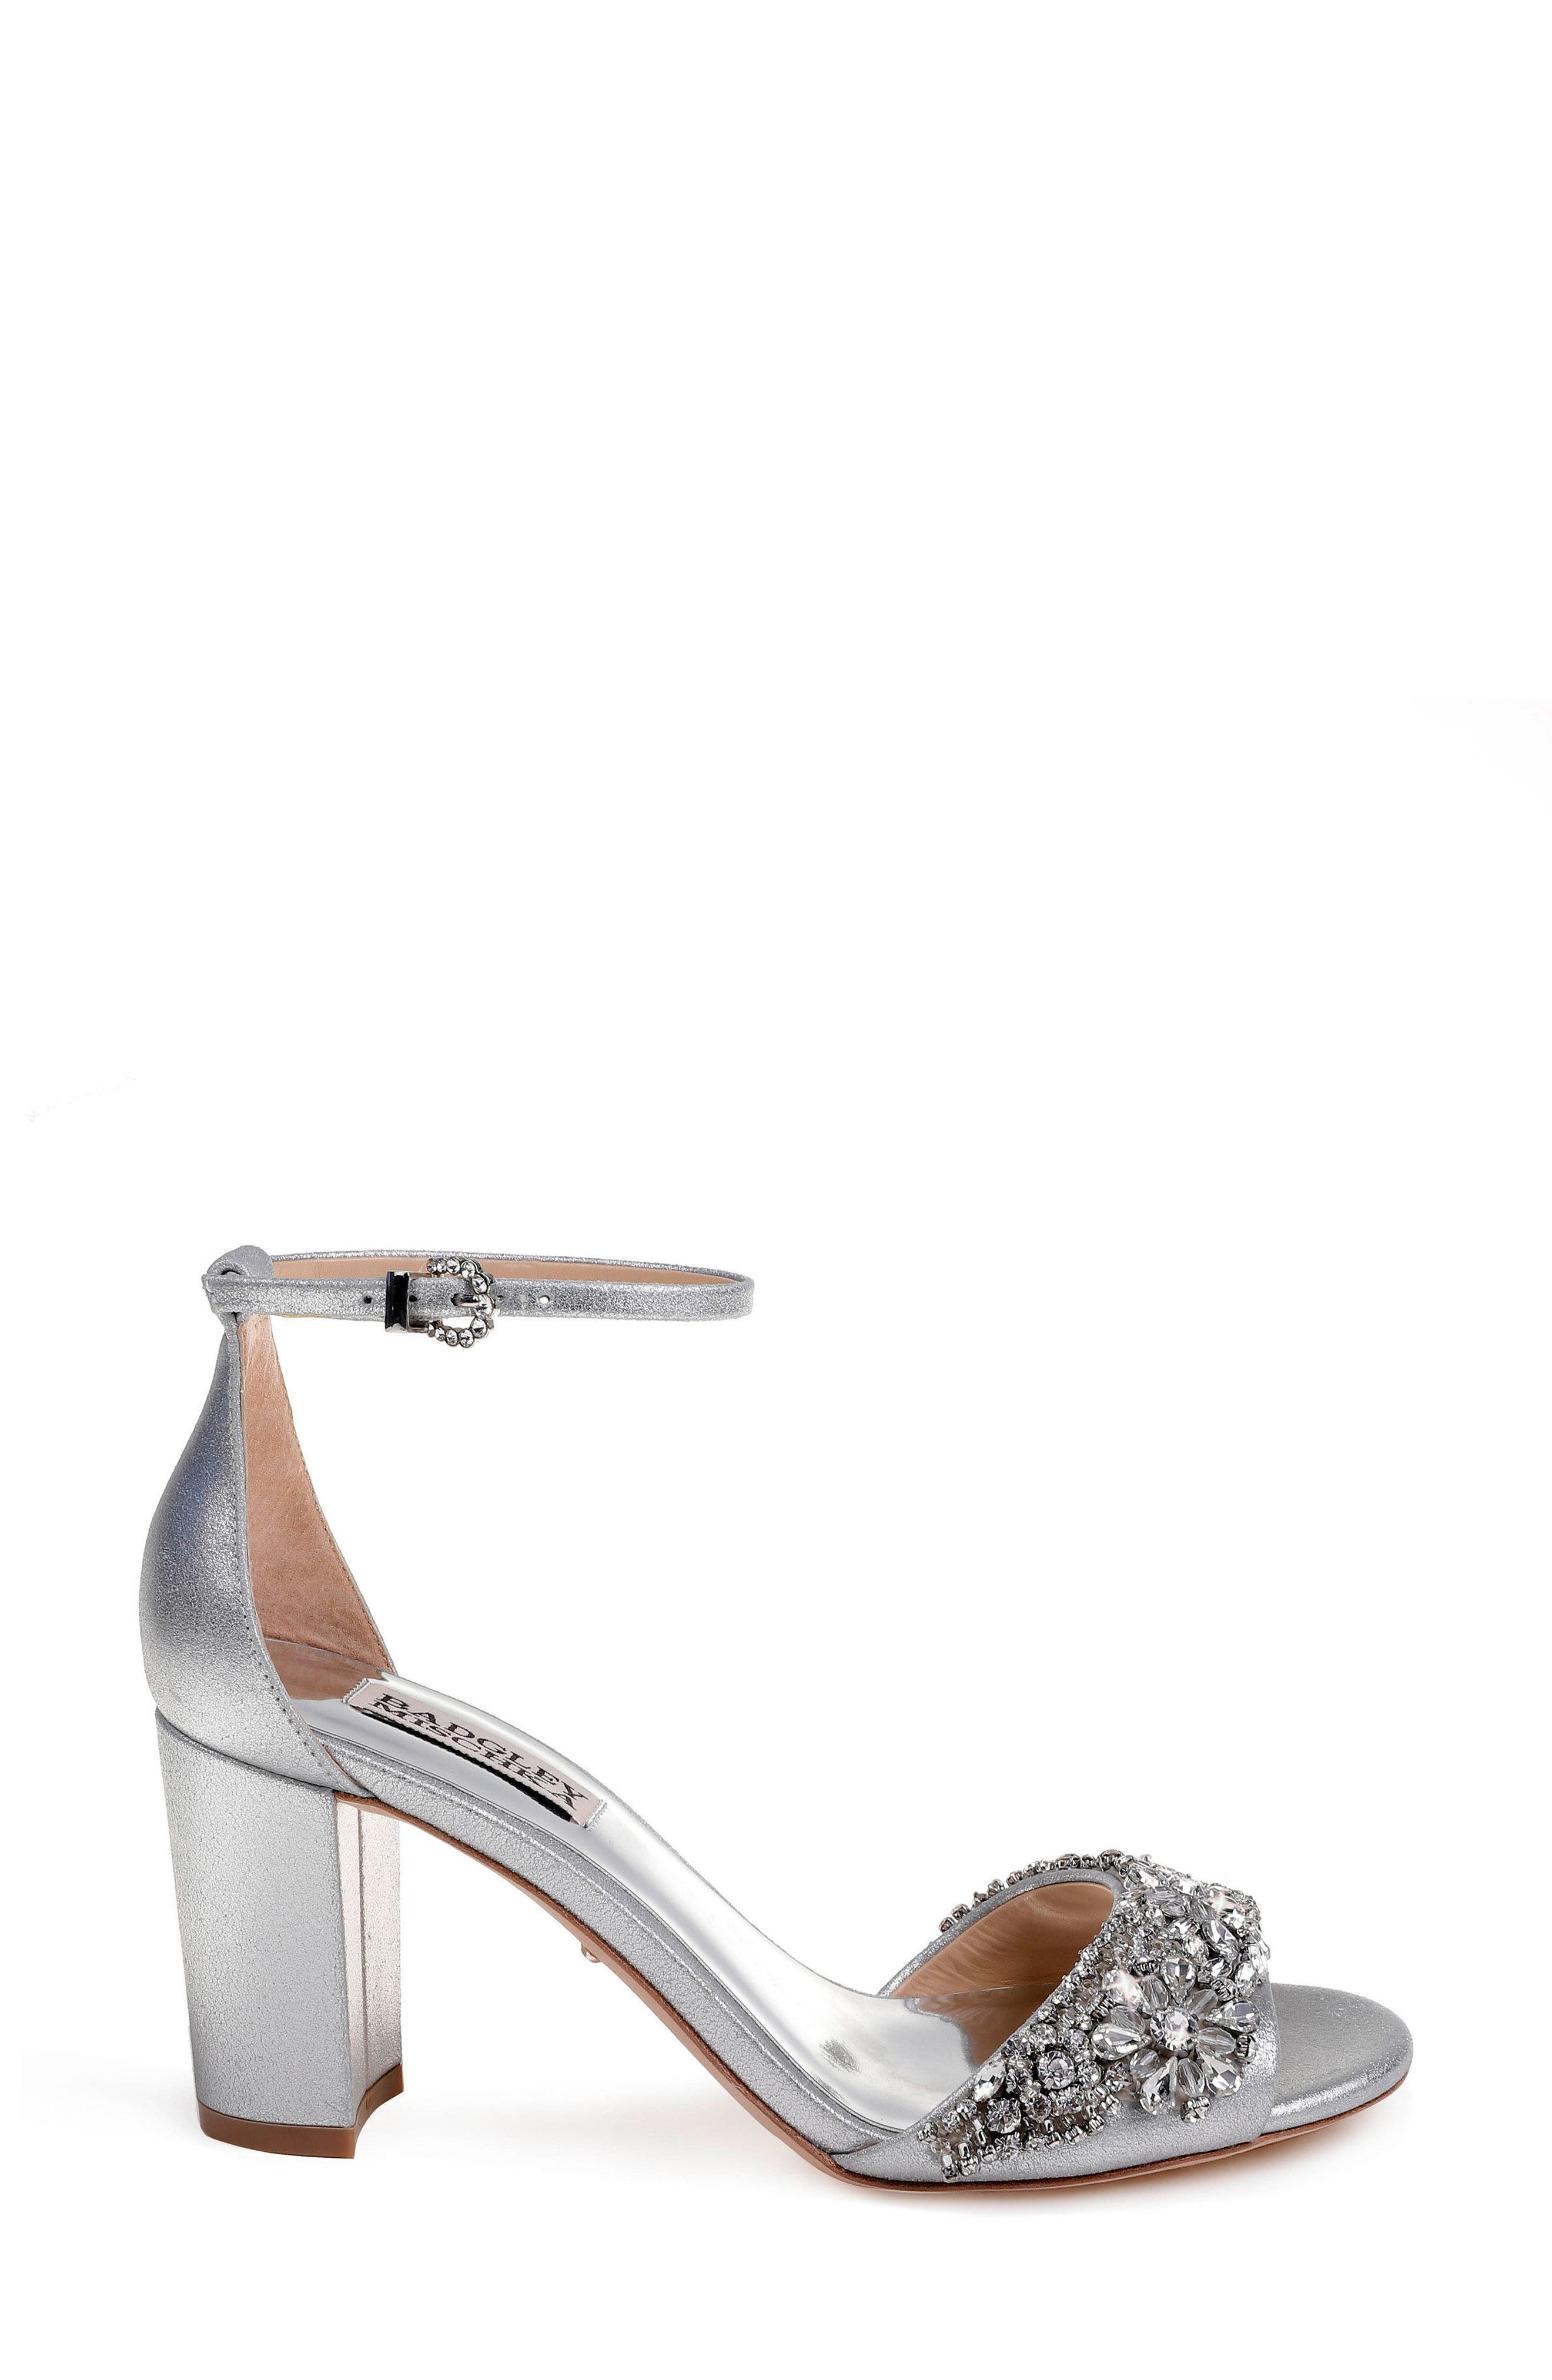 Hines Embellished Block Heel Sandal,                             Alternate thumbnail 12, color,